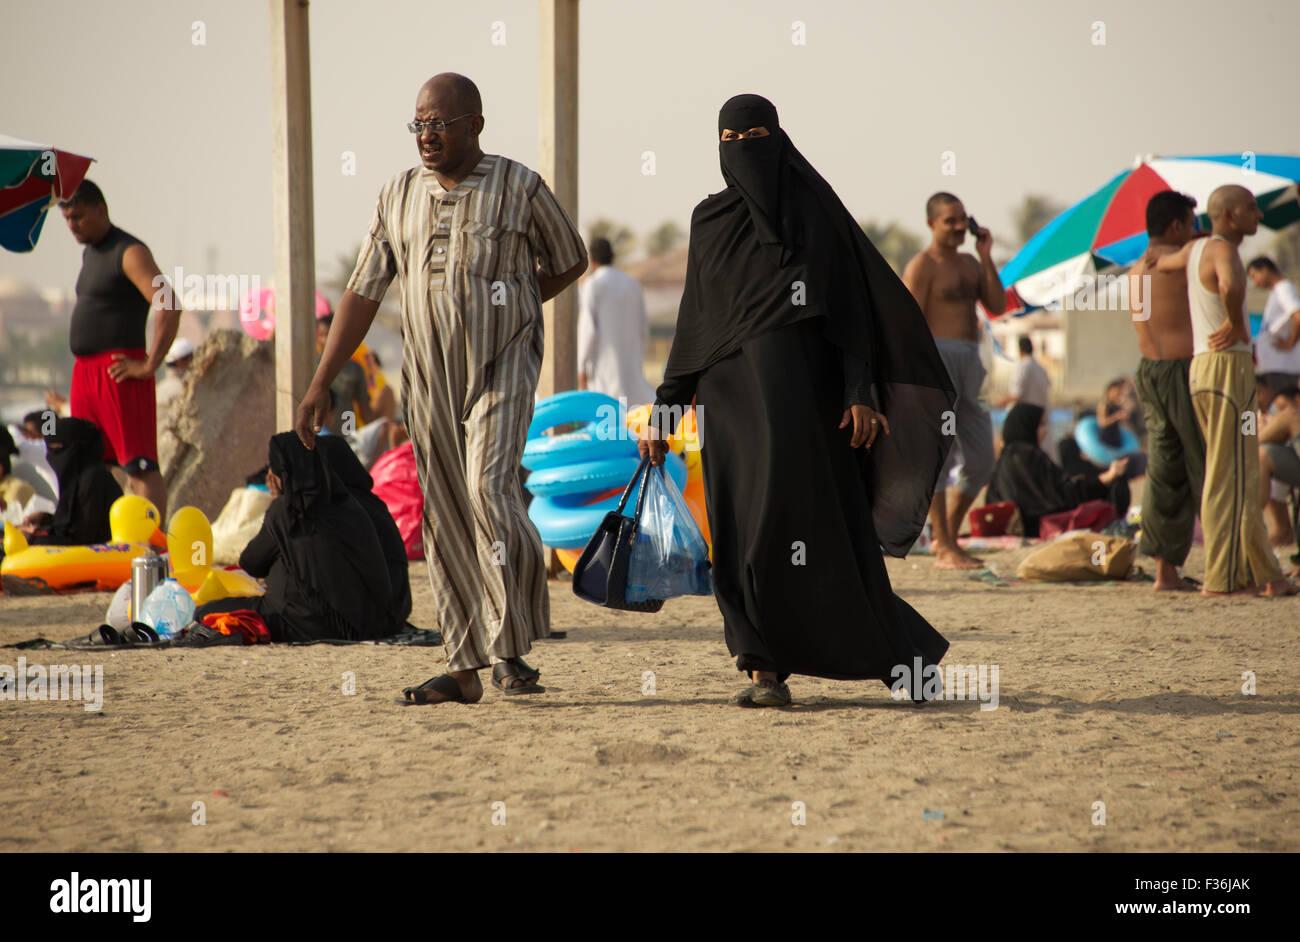 Pareja musulmana paseando por la playa del Mar Rojo en Jeddah, Arabia Saudita Imagen De Stock